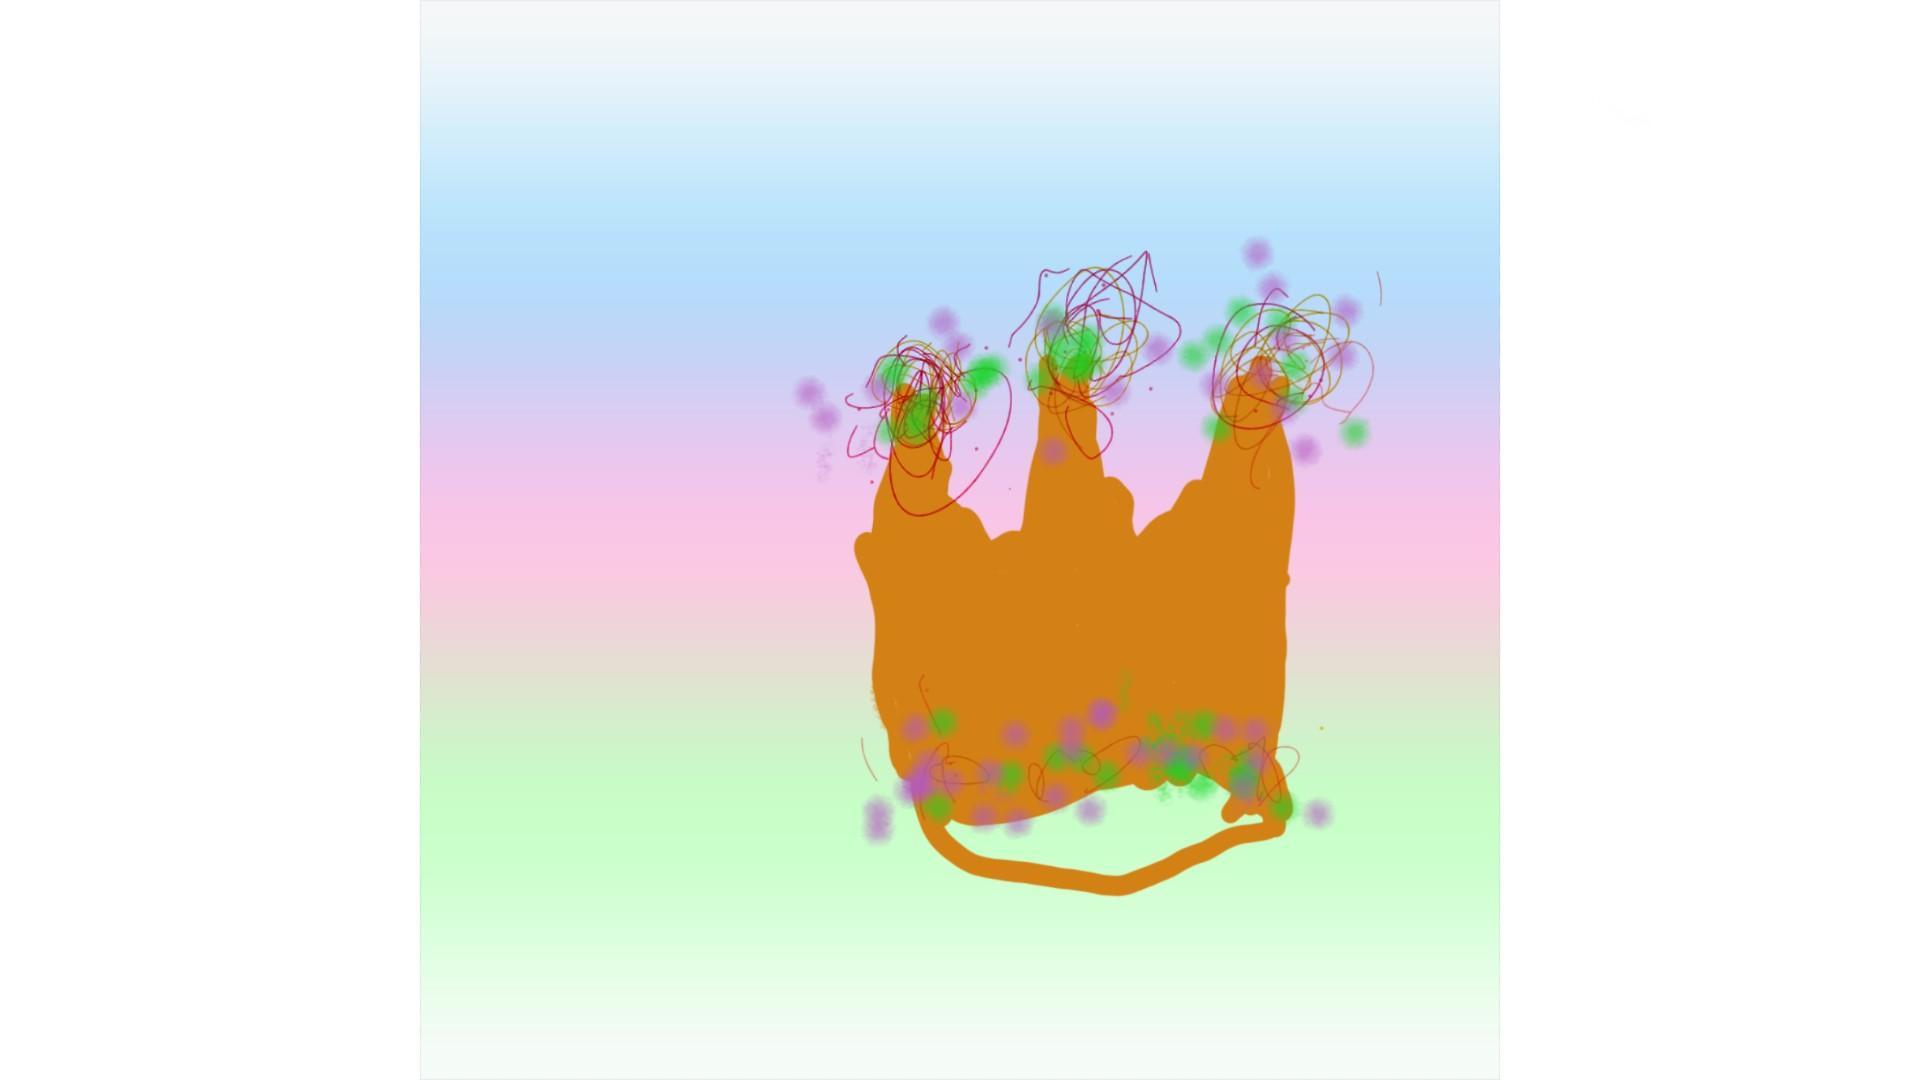 CYOAQ Illustration 8.jpg